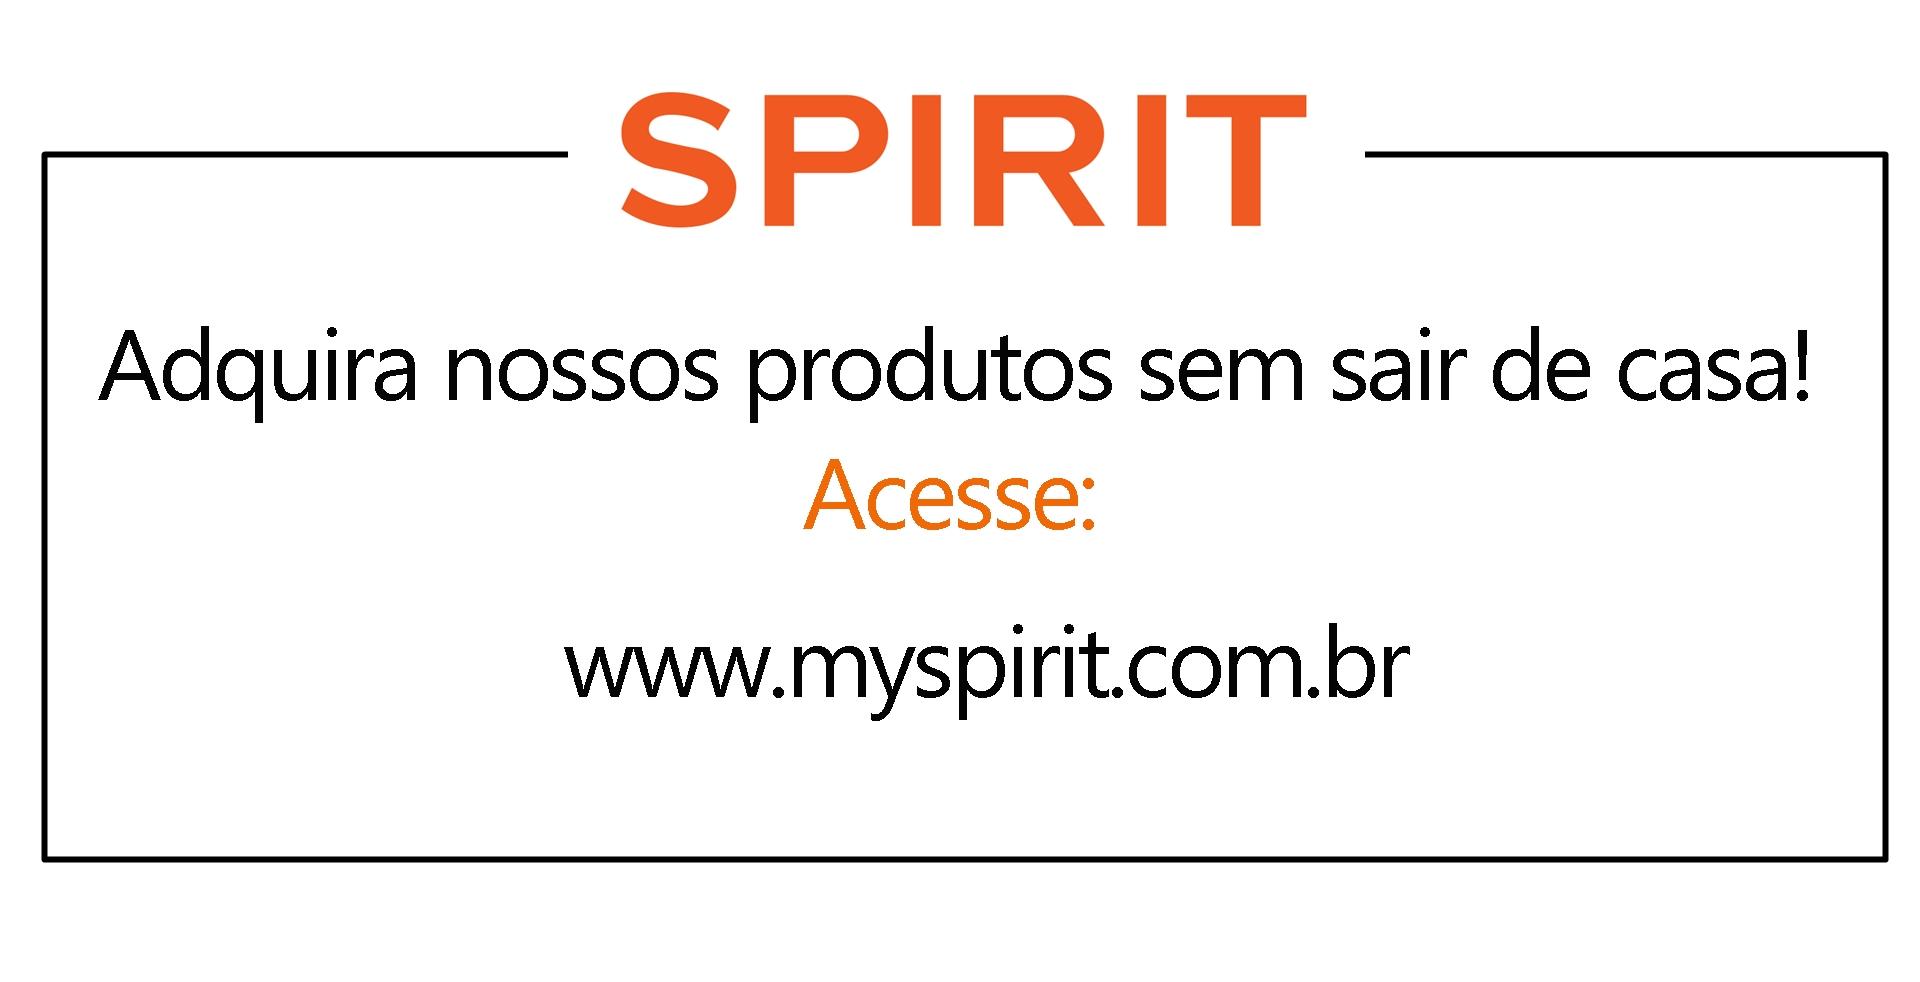 ventilador de teto Spirit - Blog Myspirit - banner site Spirit - Certificado do Selo Procel de Economia de Energia 2016